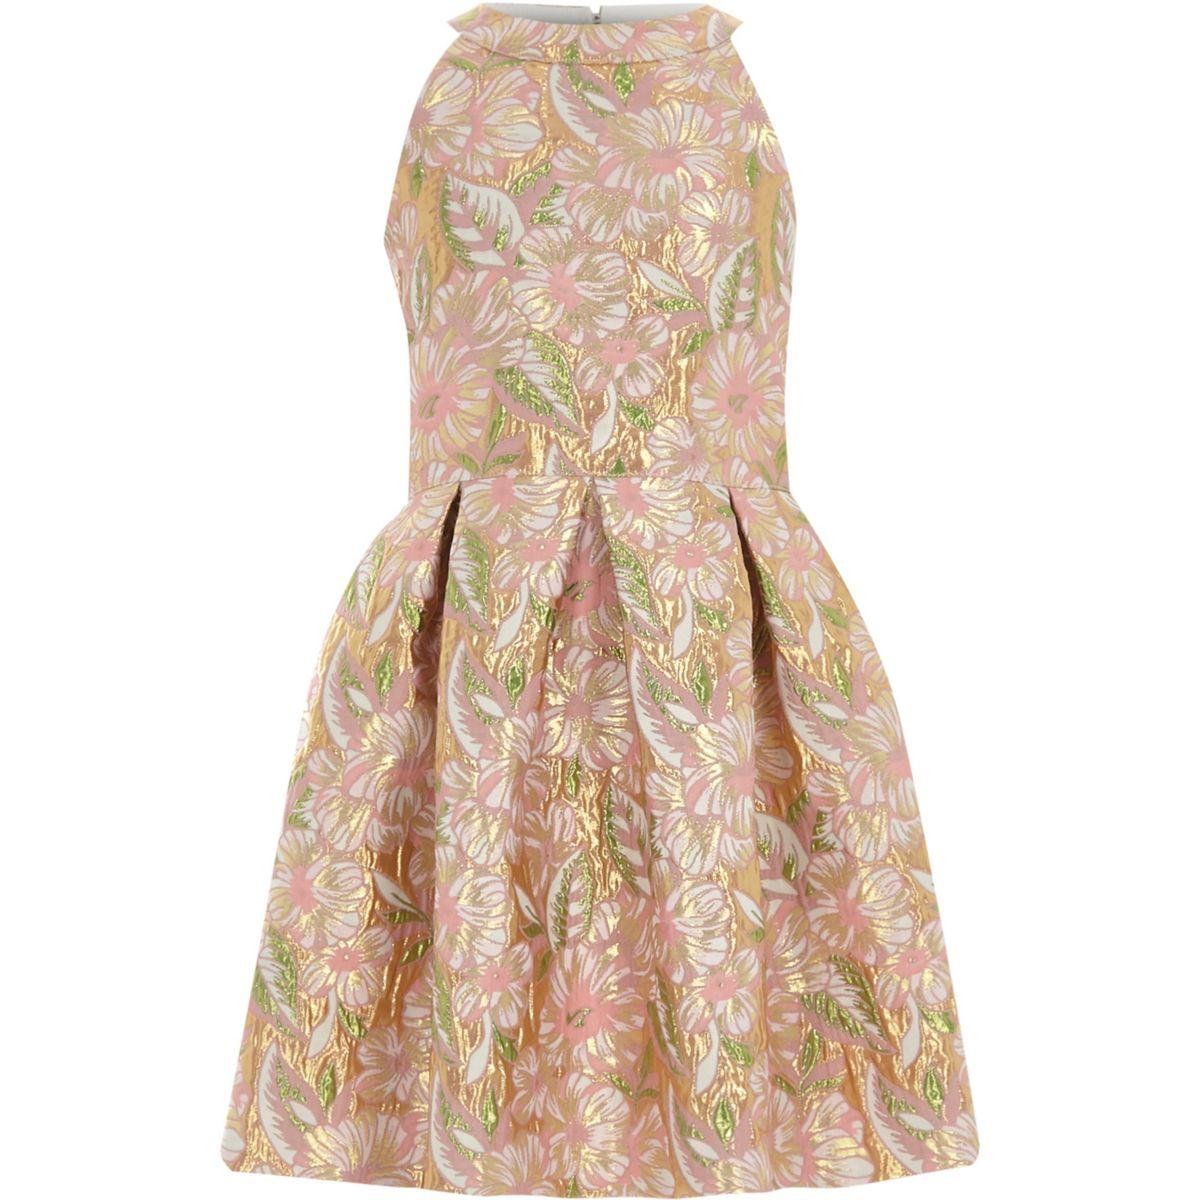 Girls pink floral brocade prom dress